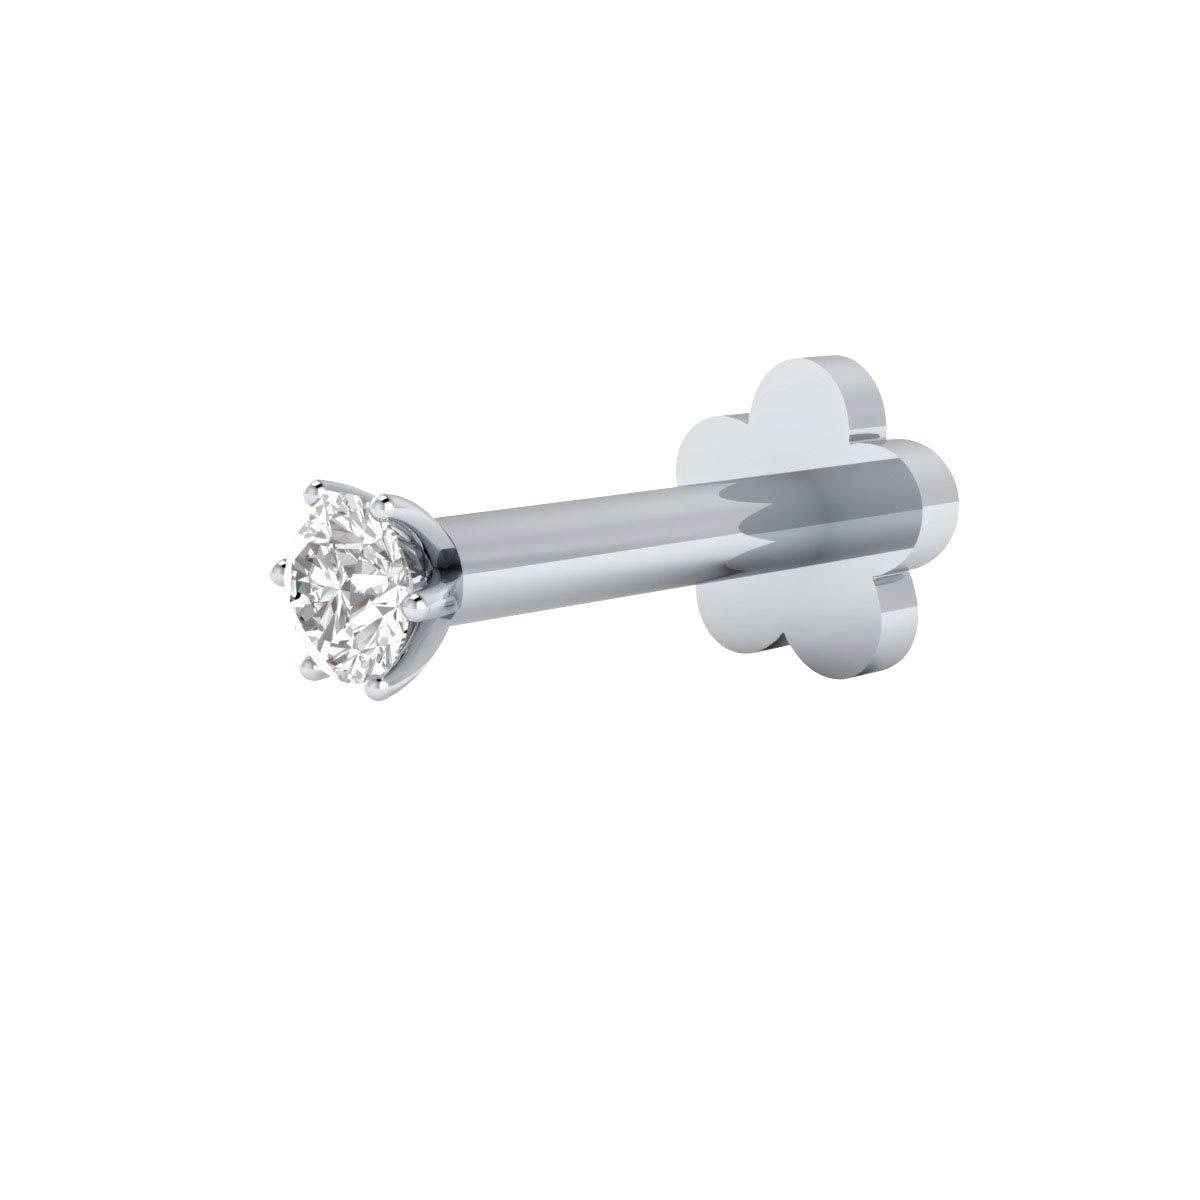 Animas Jewels 1.7mm Natural Diamond Nose Lip Labret Monroe Ring Screw Stud Nose Pin Solid 14k White Gold Certified (6, White-Gold)